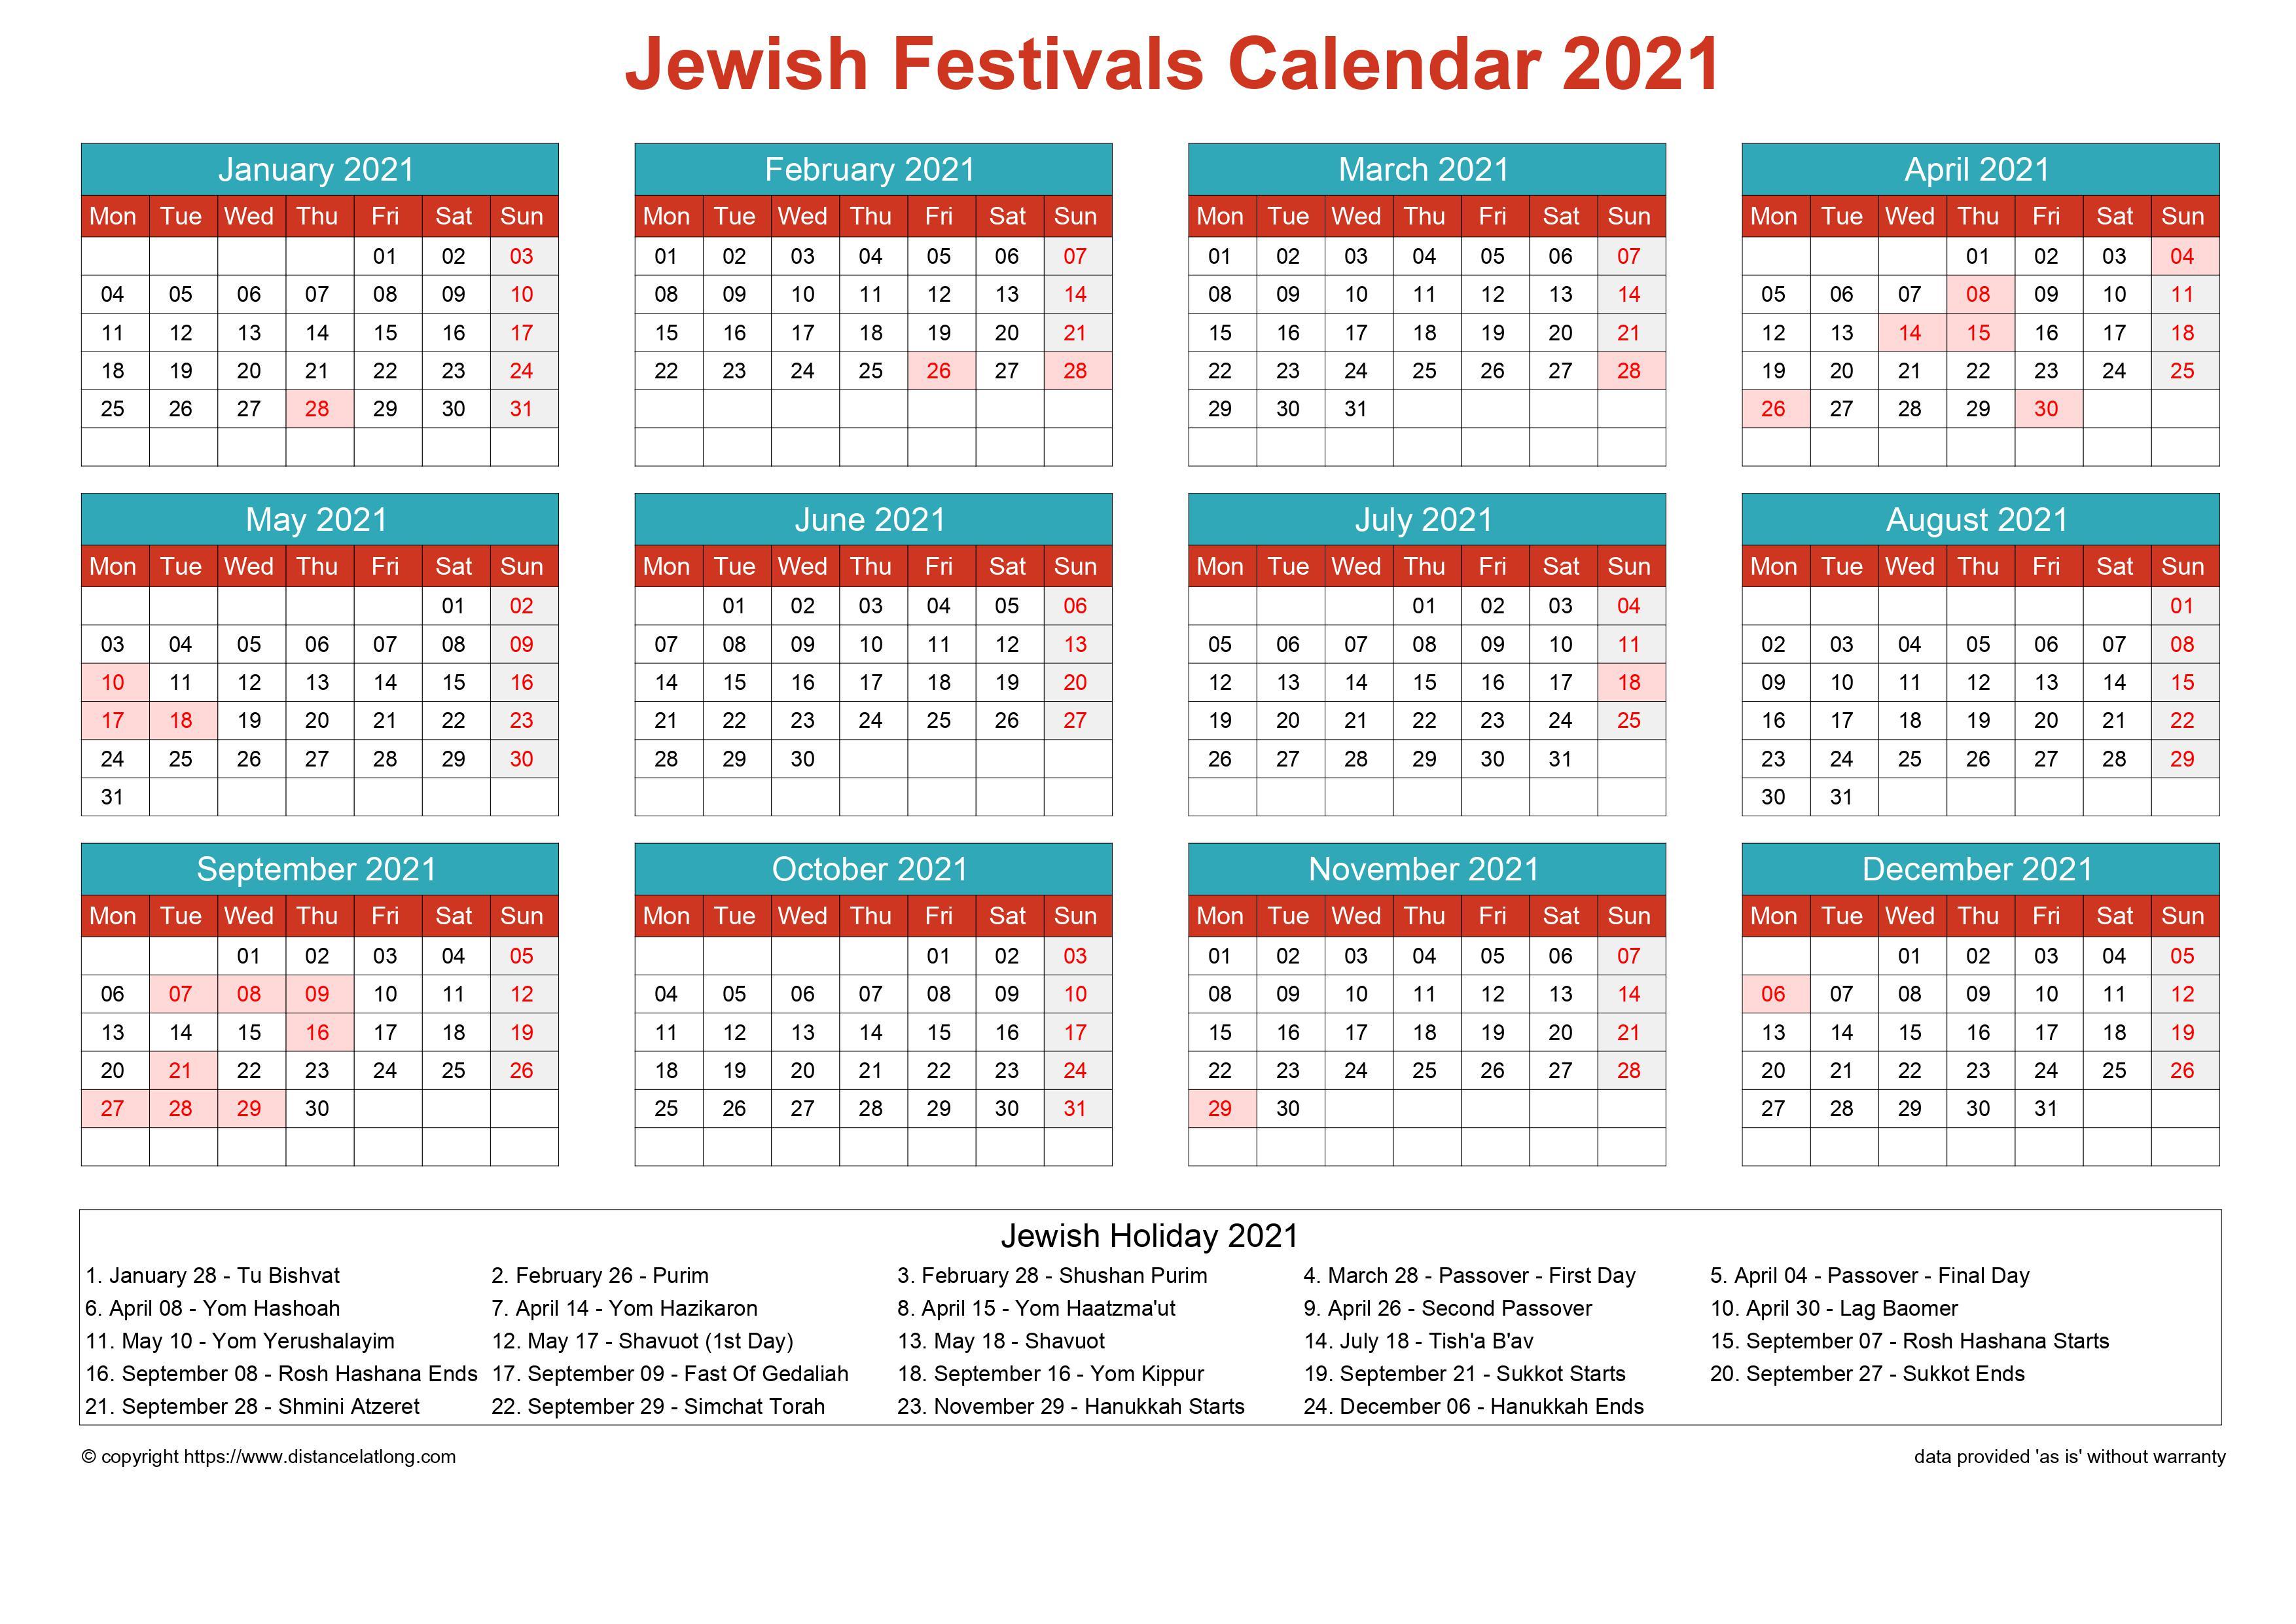 Jewish Holidays Calendar 2022.Jewish Holiday Calendar 2021 Jpg Templates Distancelatlong Com1